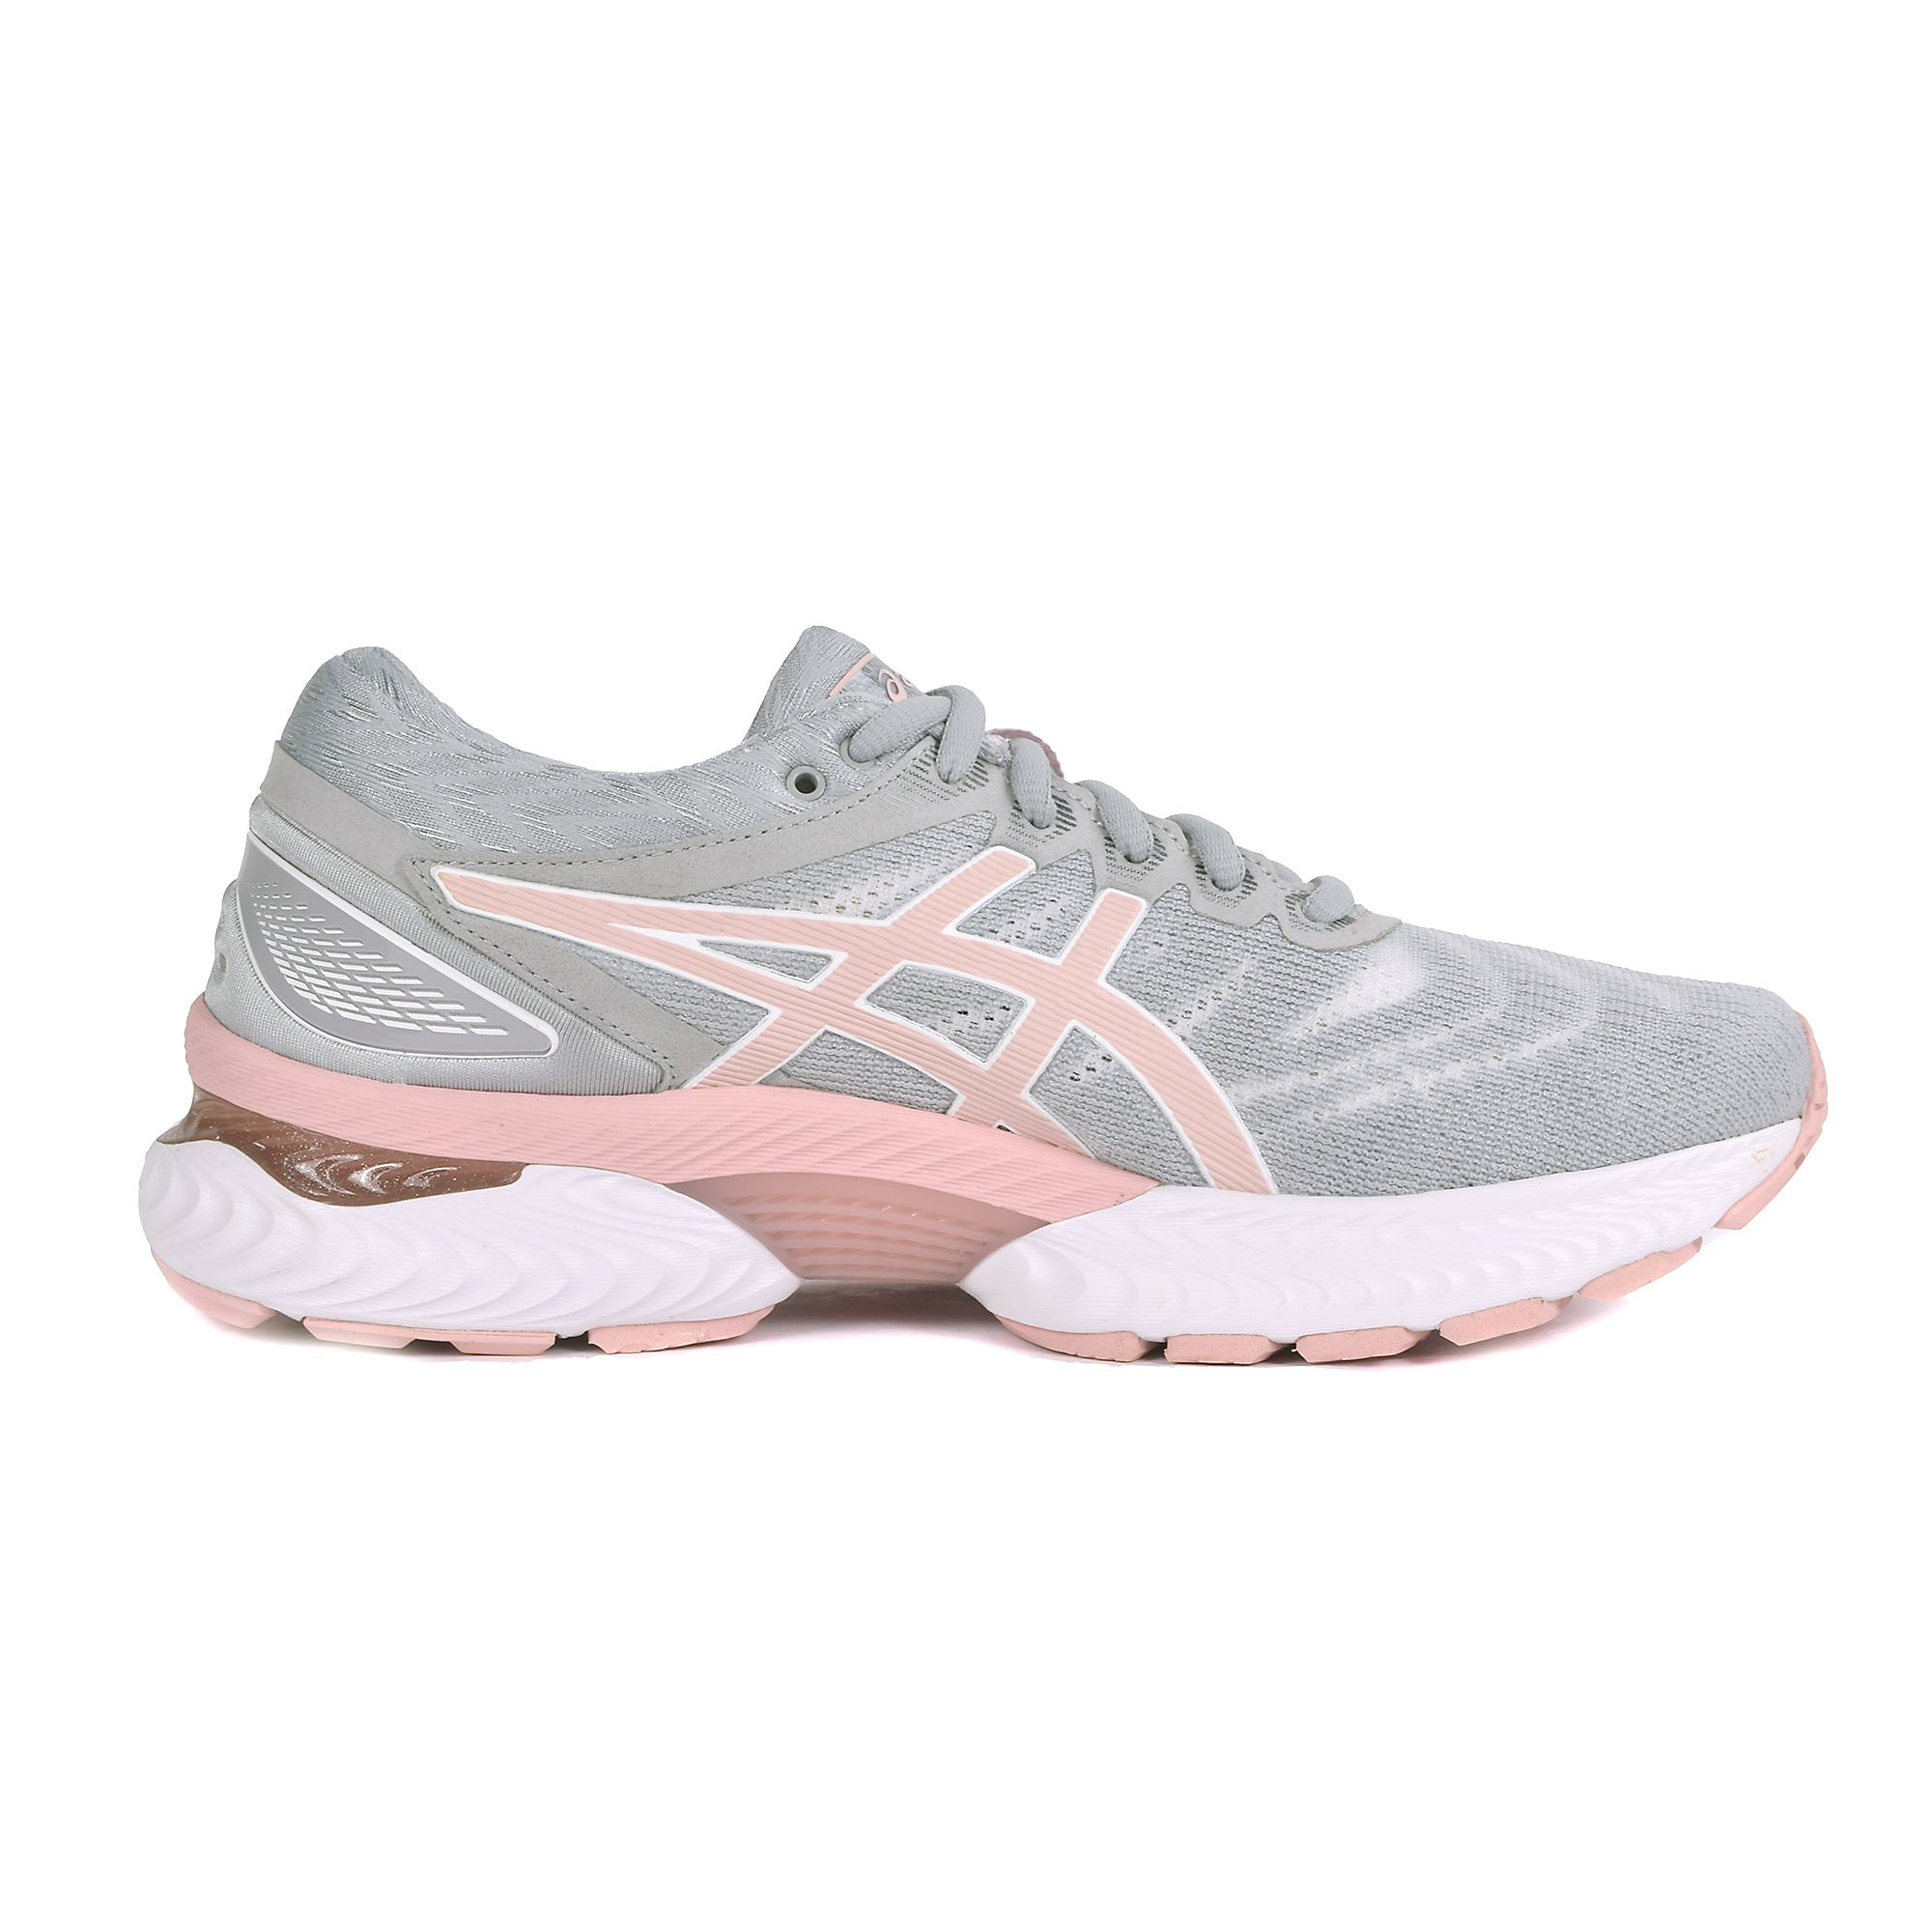 Women's Asics Gel-Nimbus 22 Running Shoe - Color: White/Rose Gold (Regular Width) - Size: 5, White, large, image 2